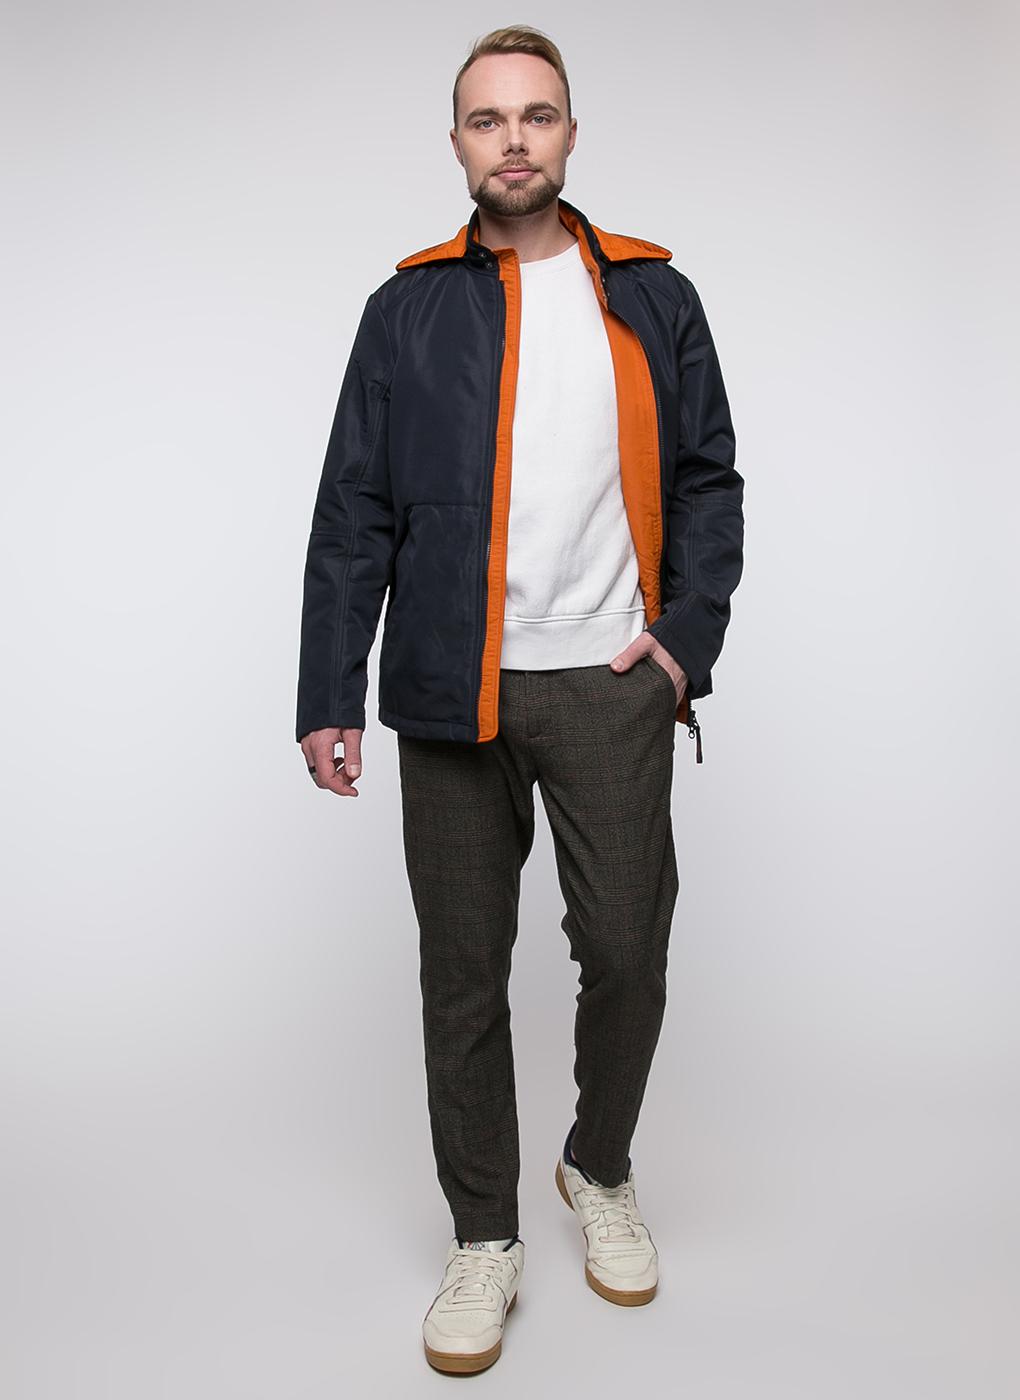 Куртка мужская утепленная 06, Snowimage фото